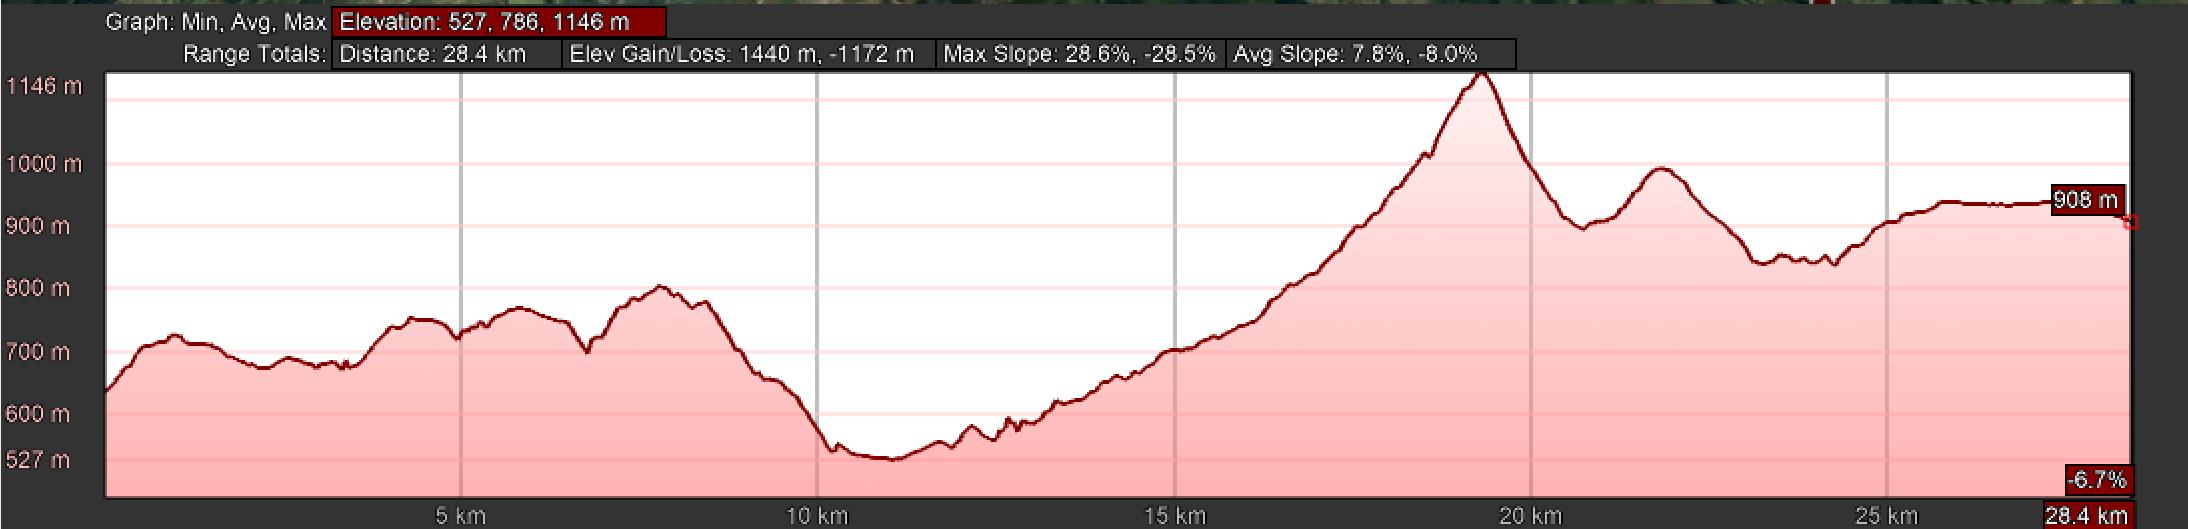 Elevation Profile, Borres to Berducedo via Pola de Allande